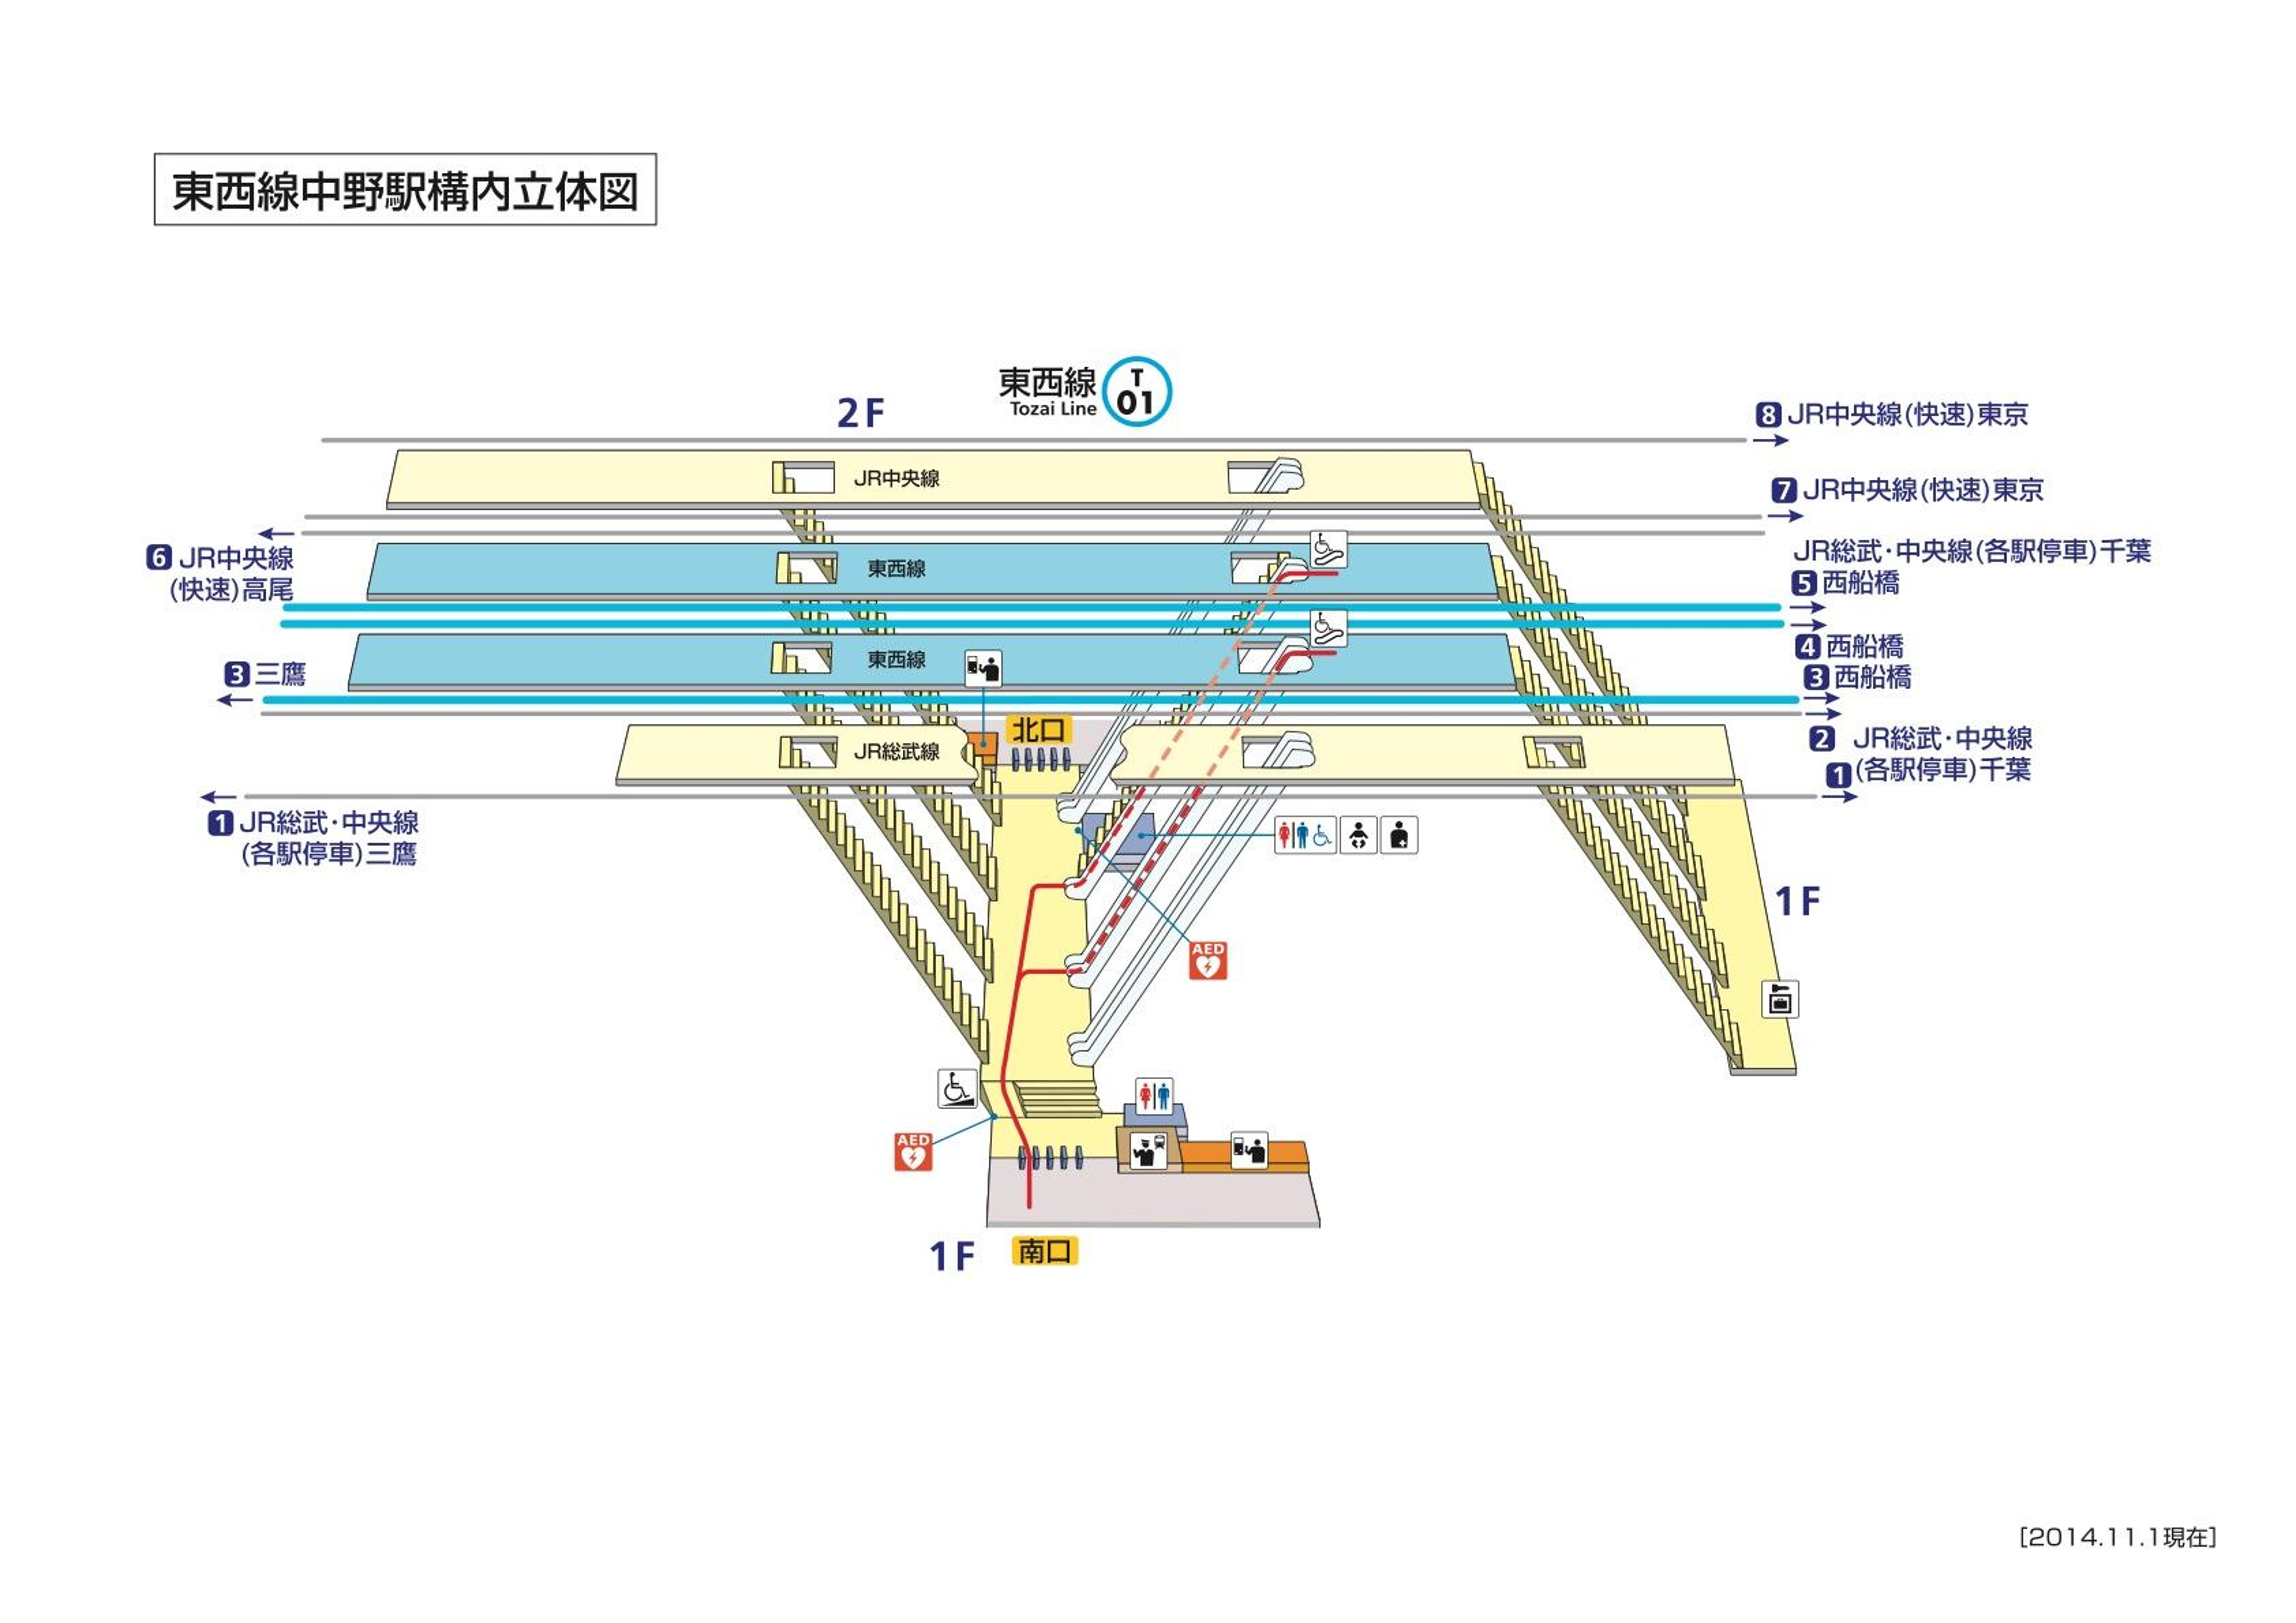 jr 中央 線